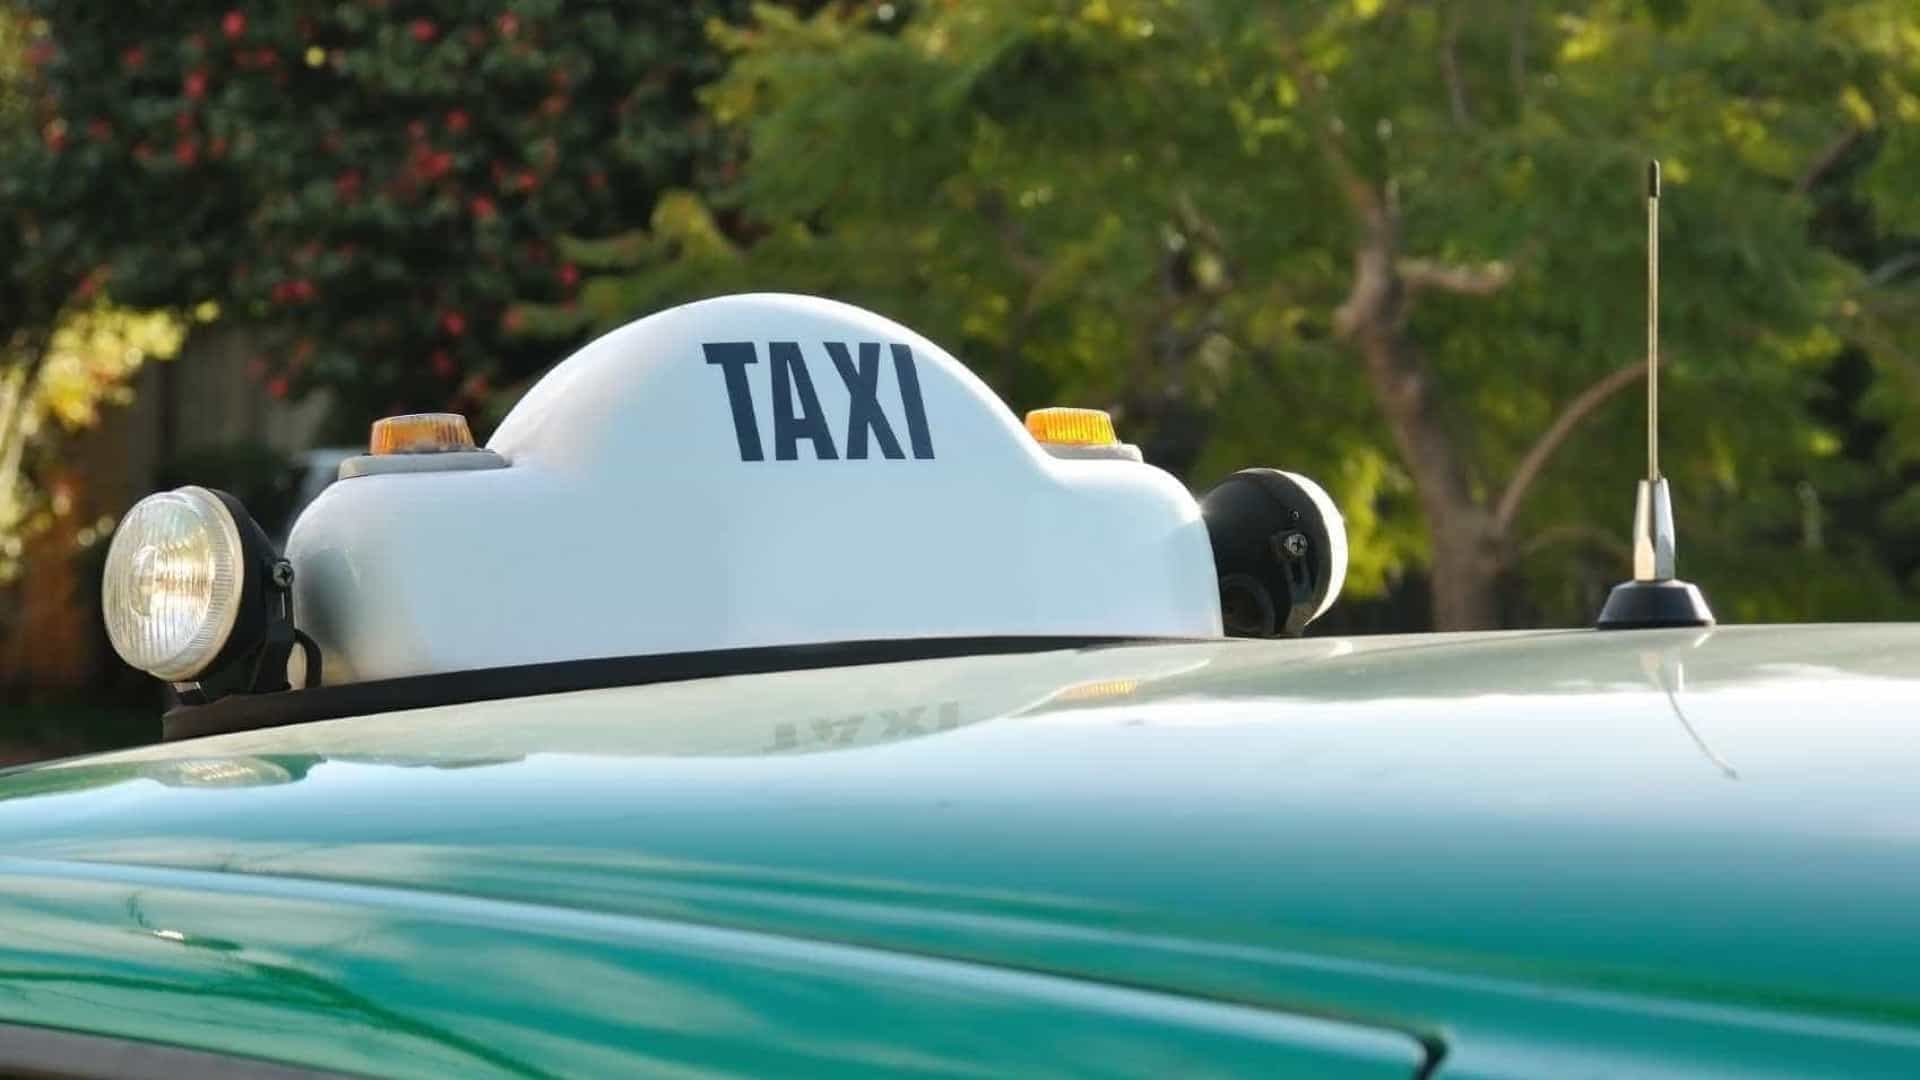 Autoridade da Concorrência desmente taxistas